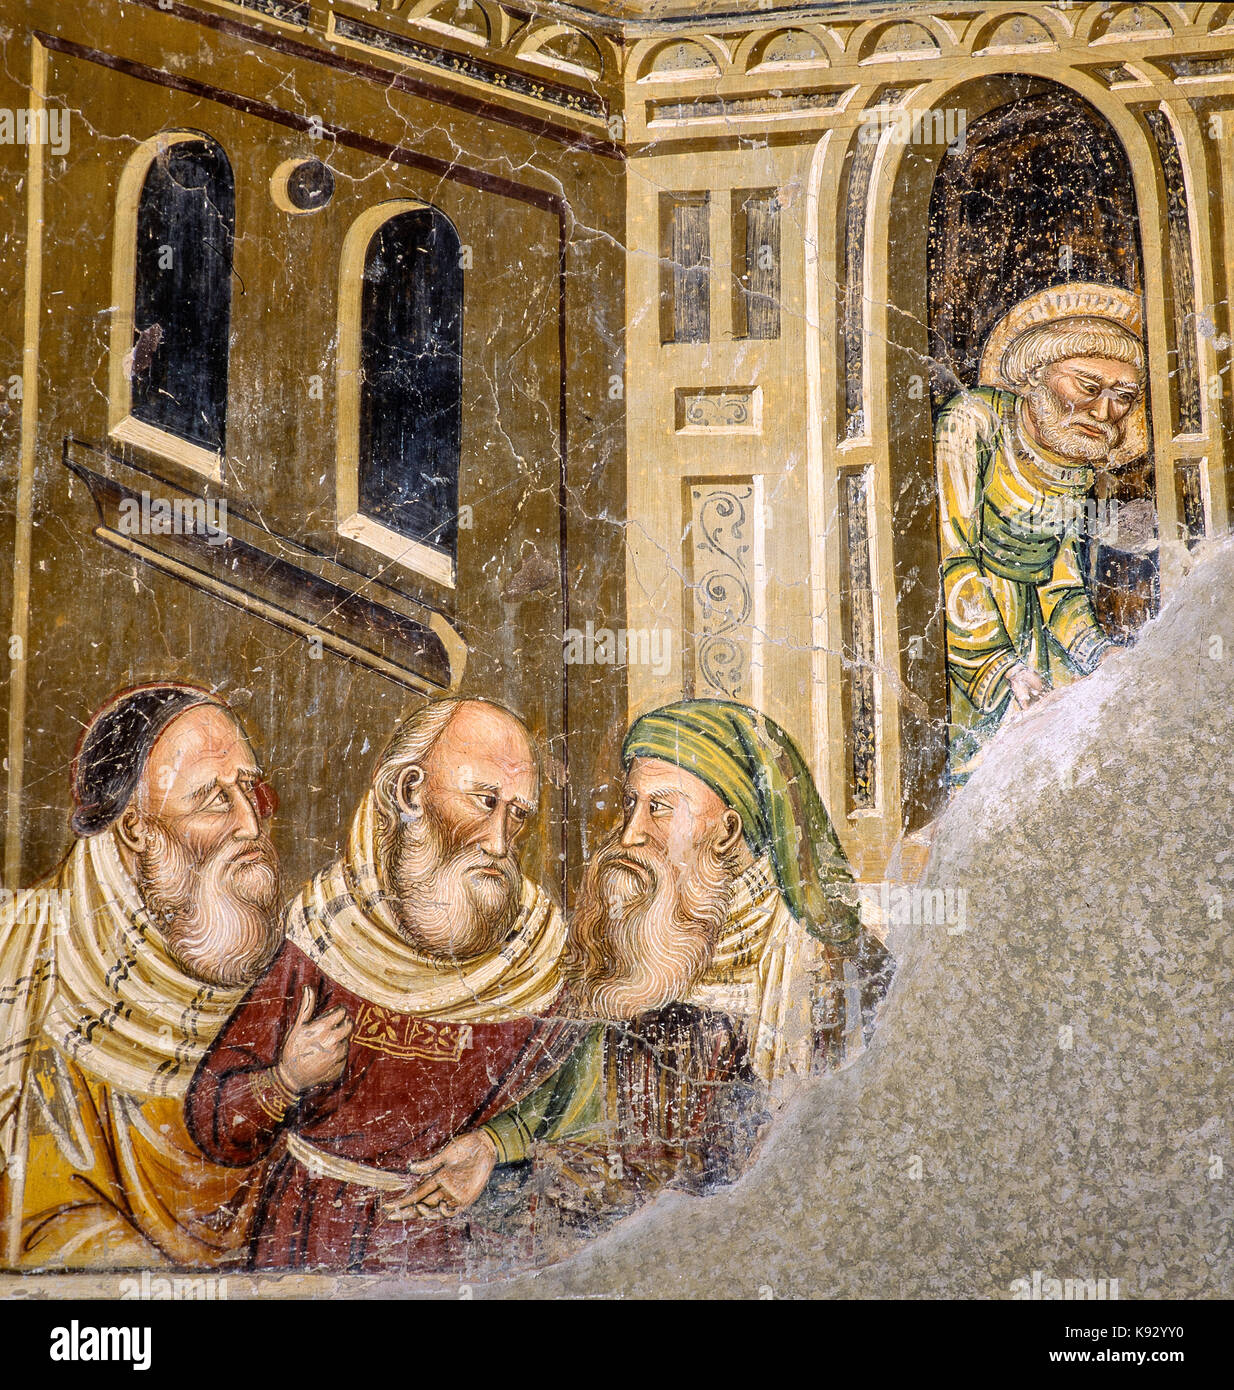 Italy Abruzzo Loreto Aprutino  Santa Maria In Piano church -iuniversal Judgment - the three patriarchs - Abraham, - Stock Image